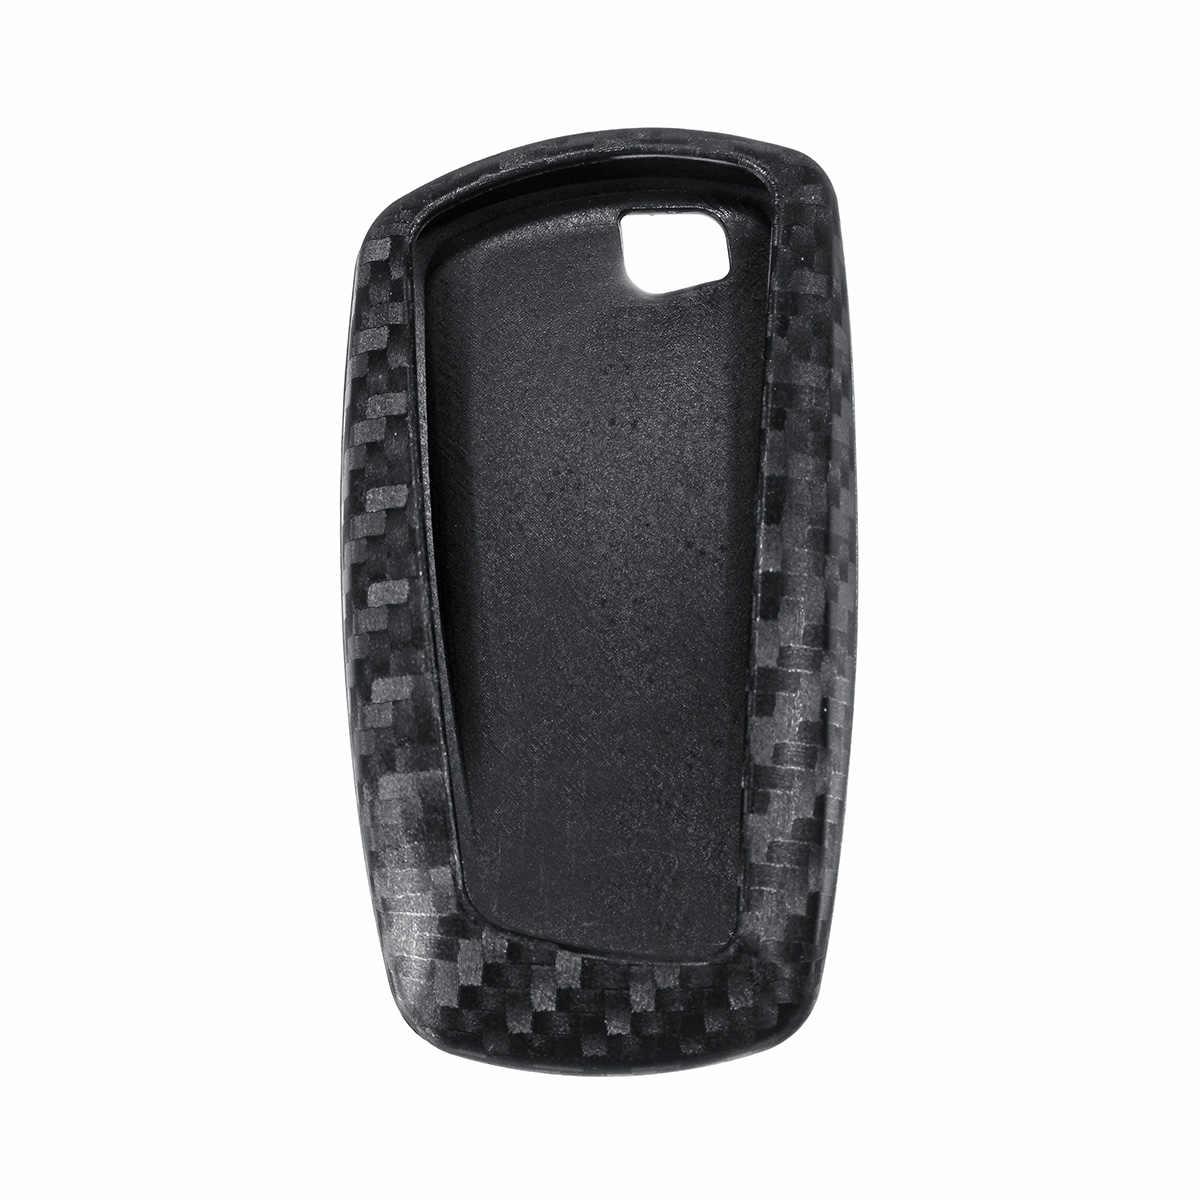 TPU عن مفتاح ذكي فوب غطاء حالة مفتاح السيارة قذيفة الكربون اللون ل BMW F05 F10 F20 F30 Z4 X1 X4 x5 X6 X7